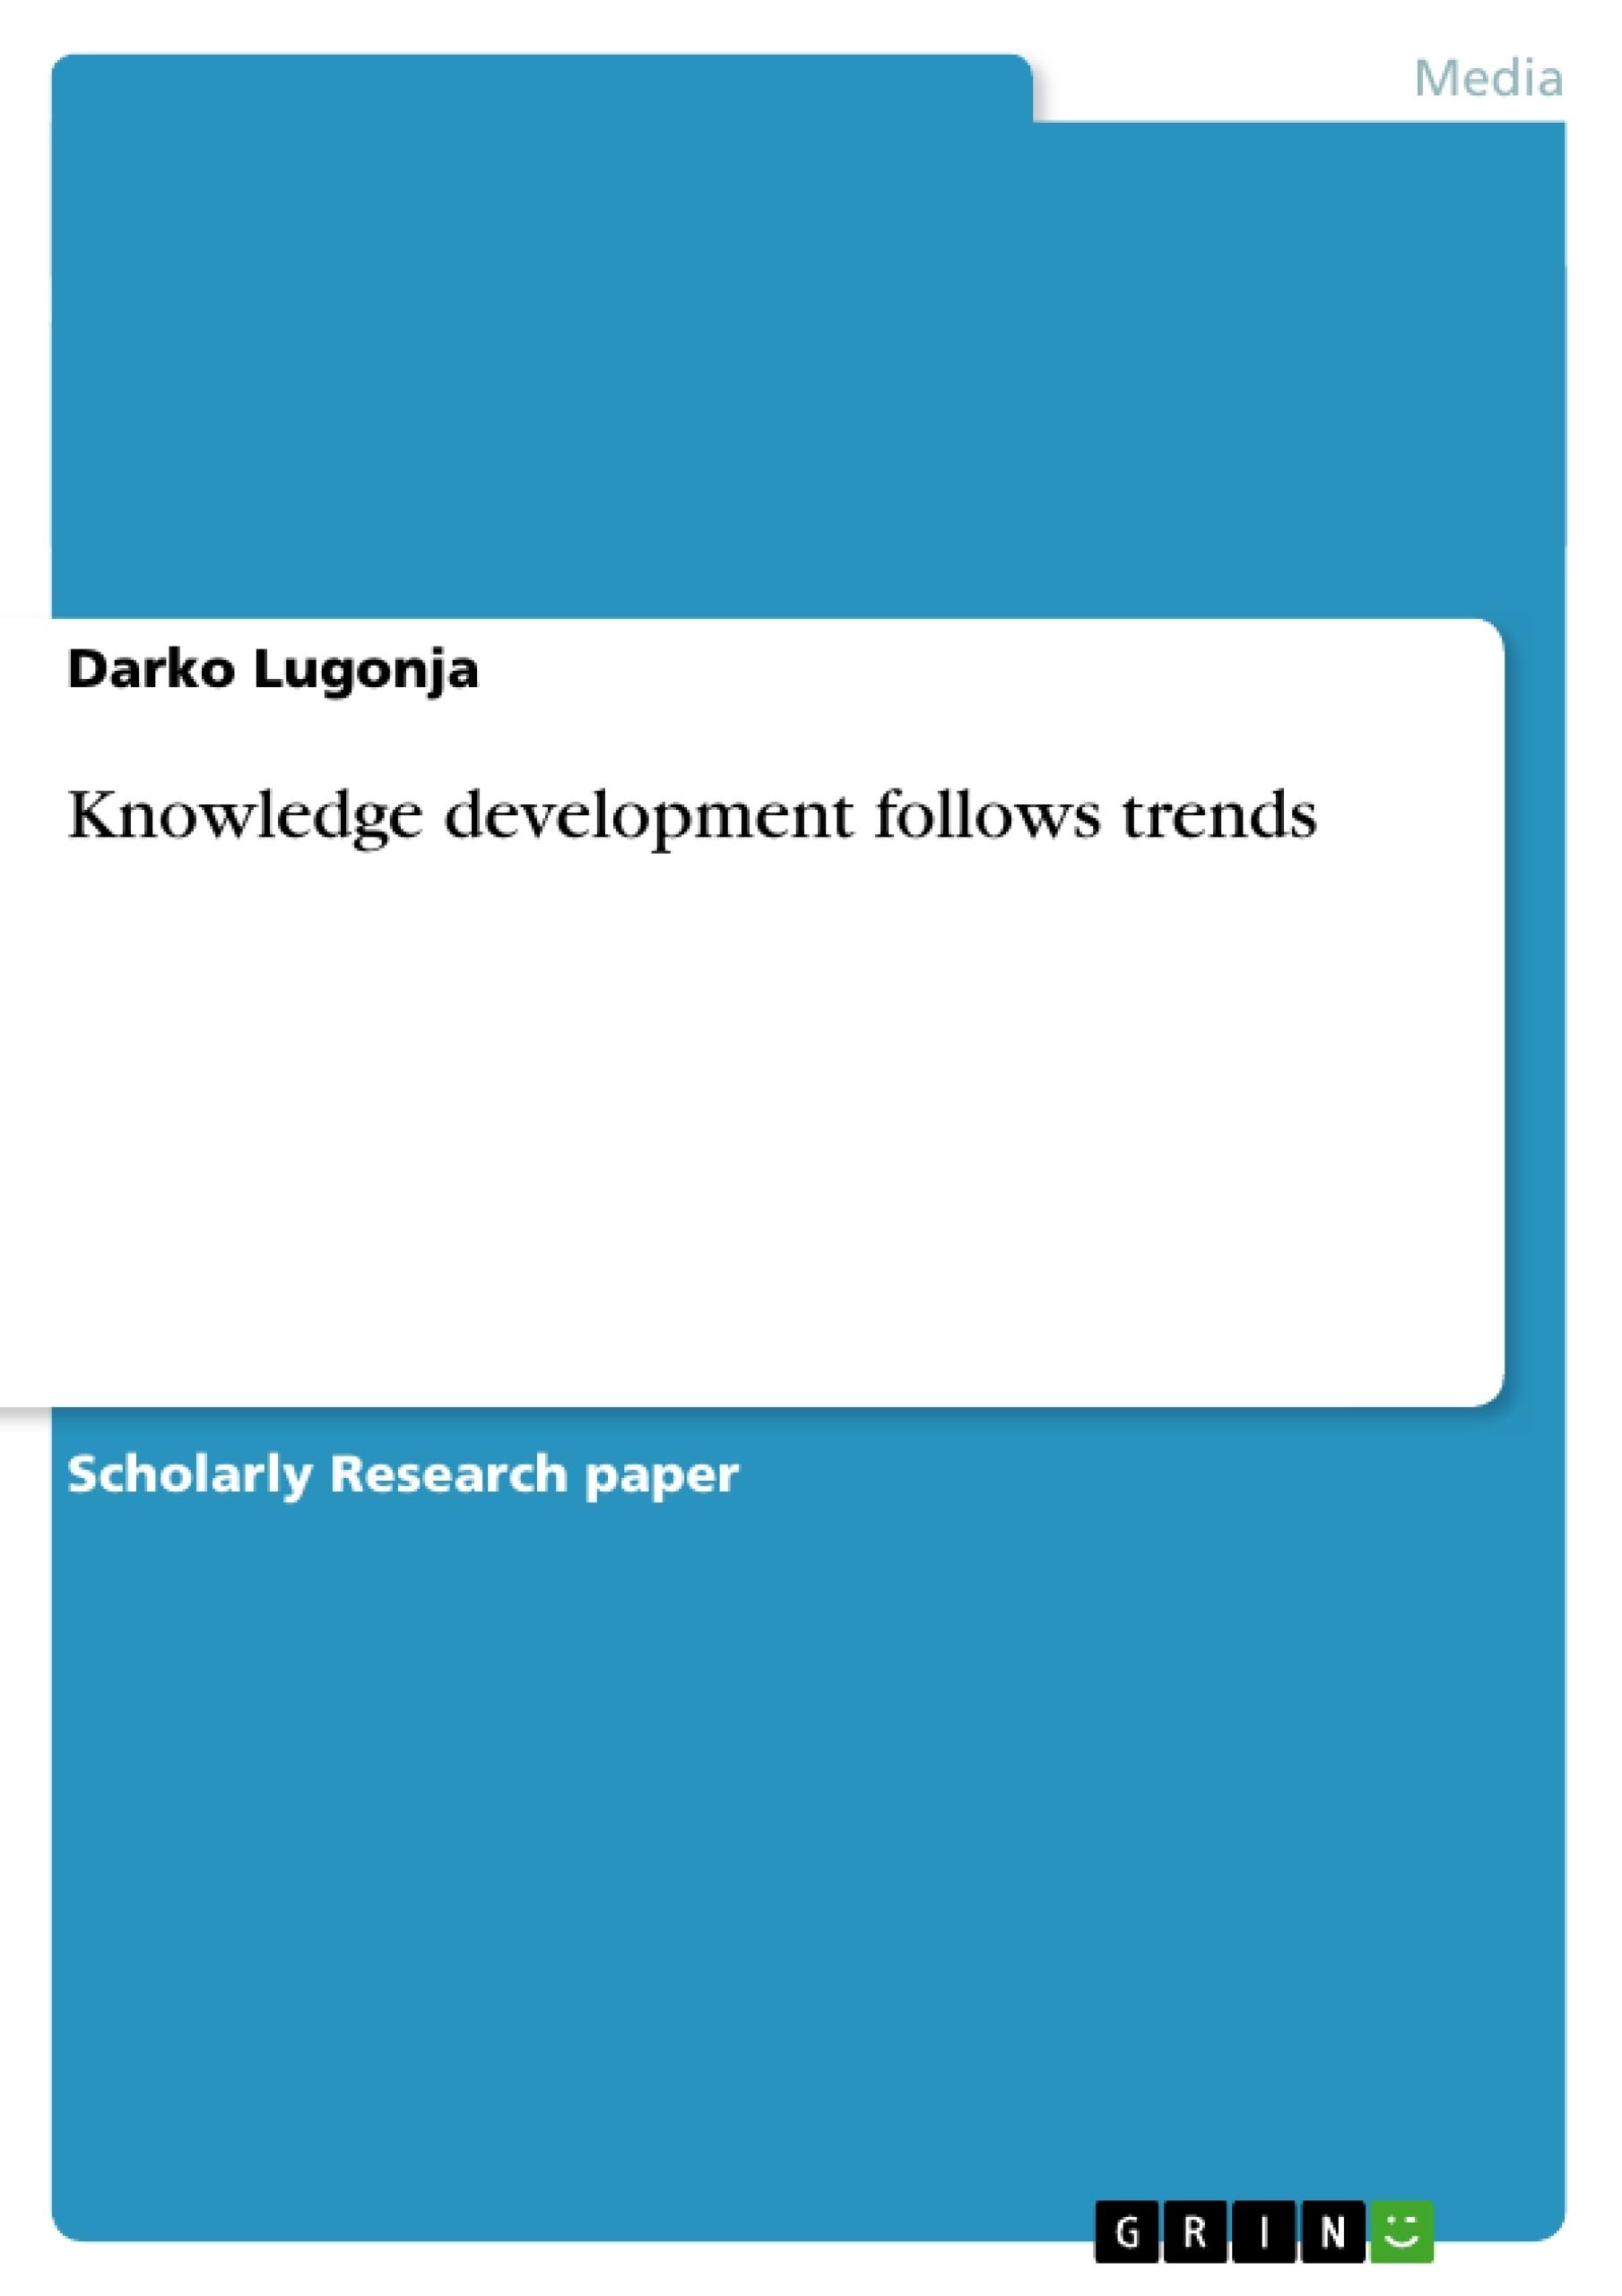 Title: Knowledge development follows trends